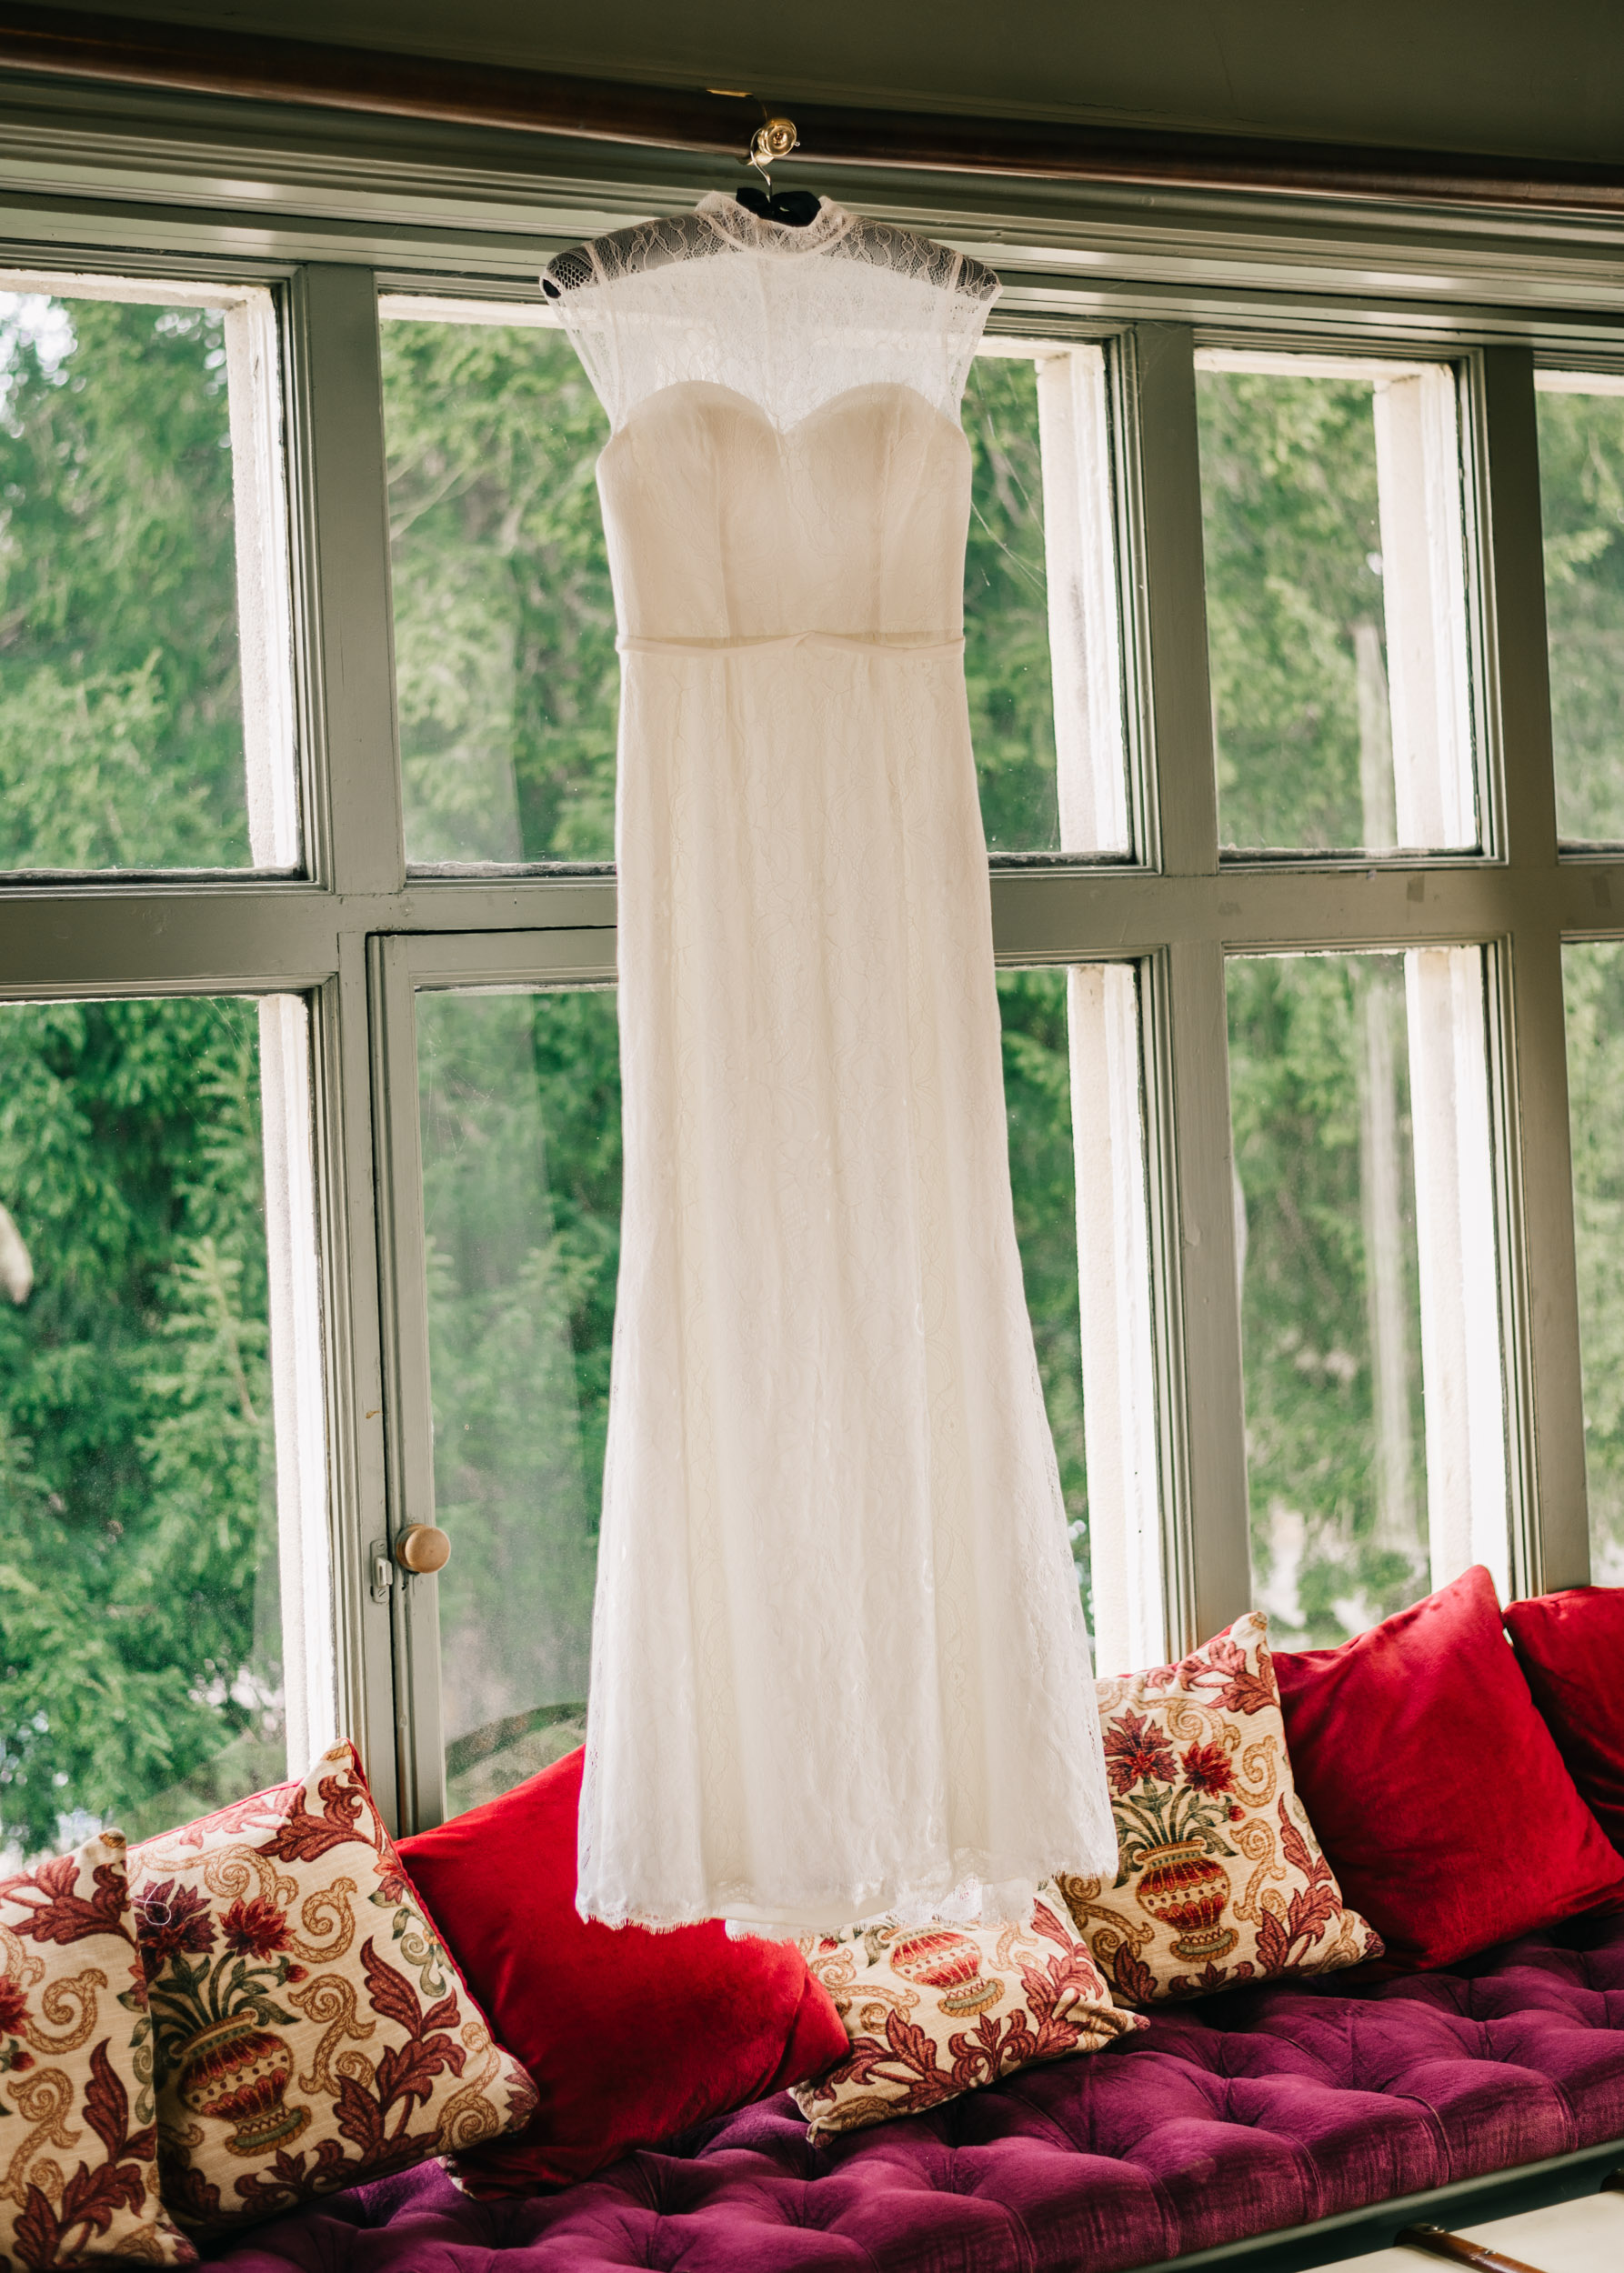 Mitton Hall, Wedding Venue Lancashire, Styled Wedding Photographers Workshop6